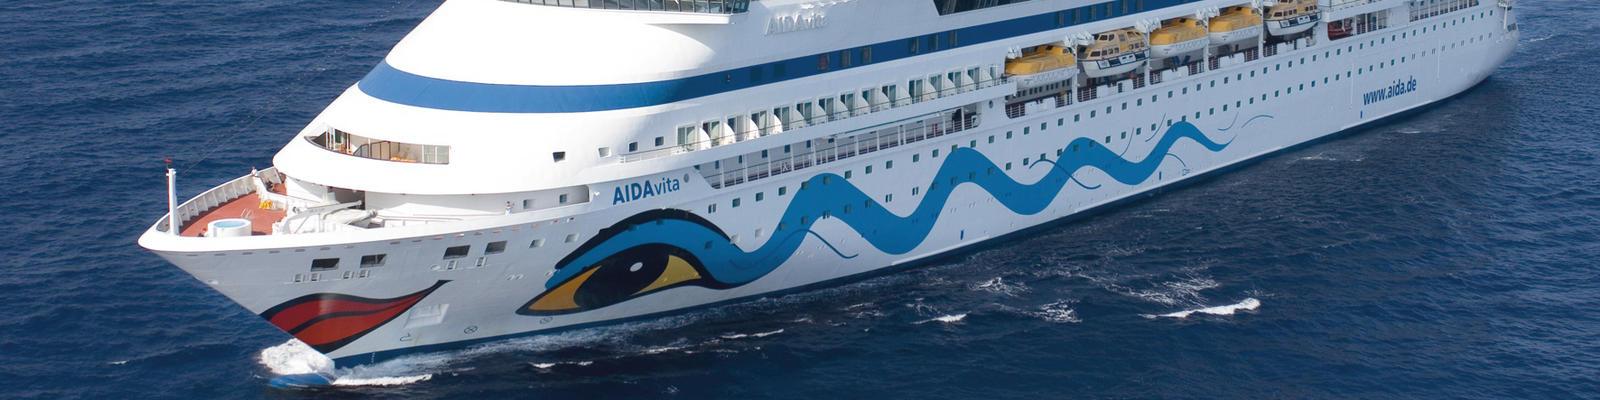 AIDAvita Cruise Ship Review Photos Departure Ports On Cruise - Cruise ship staff quarters